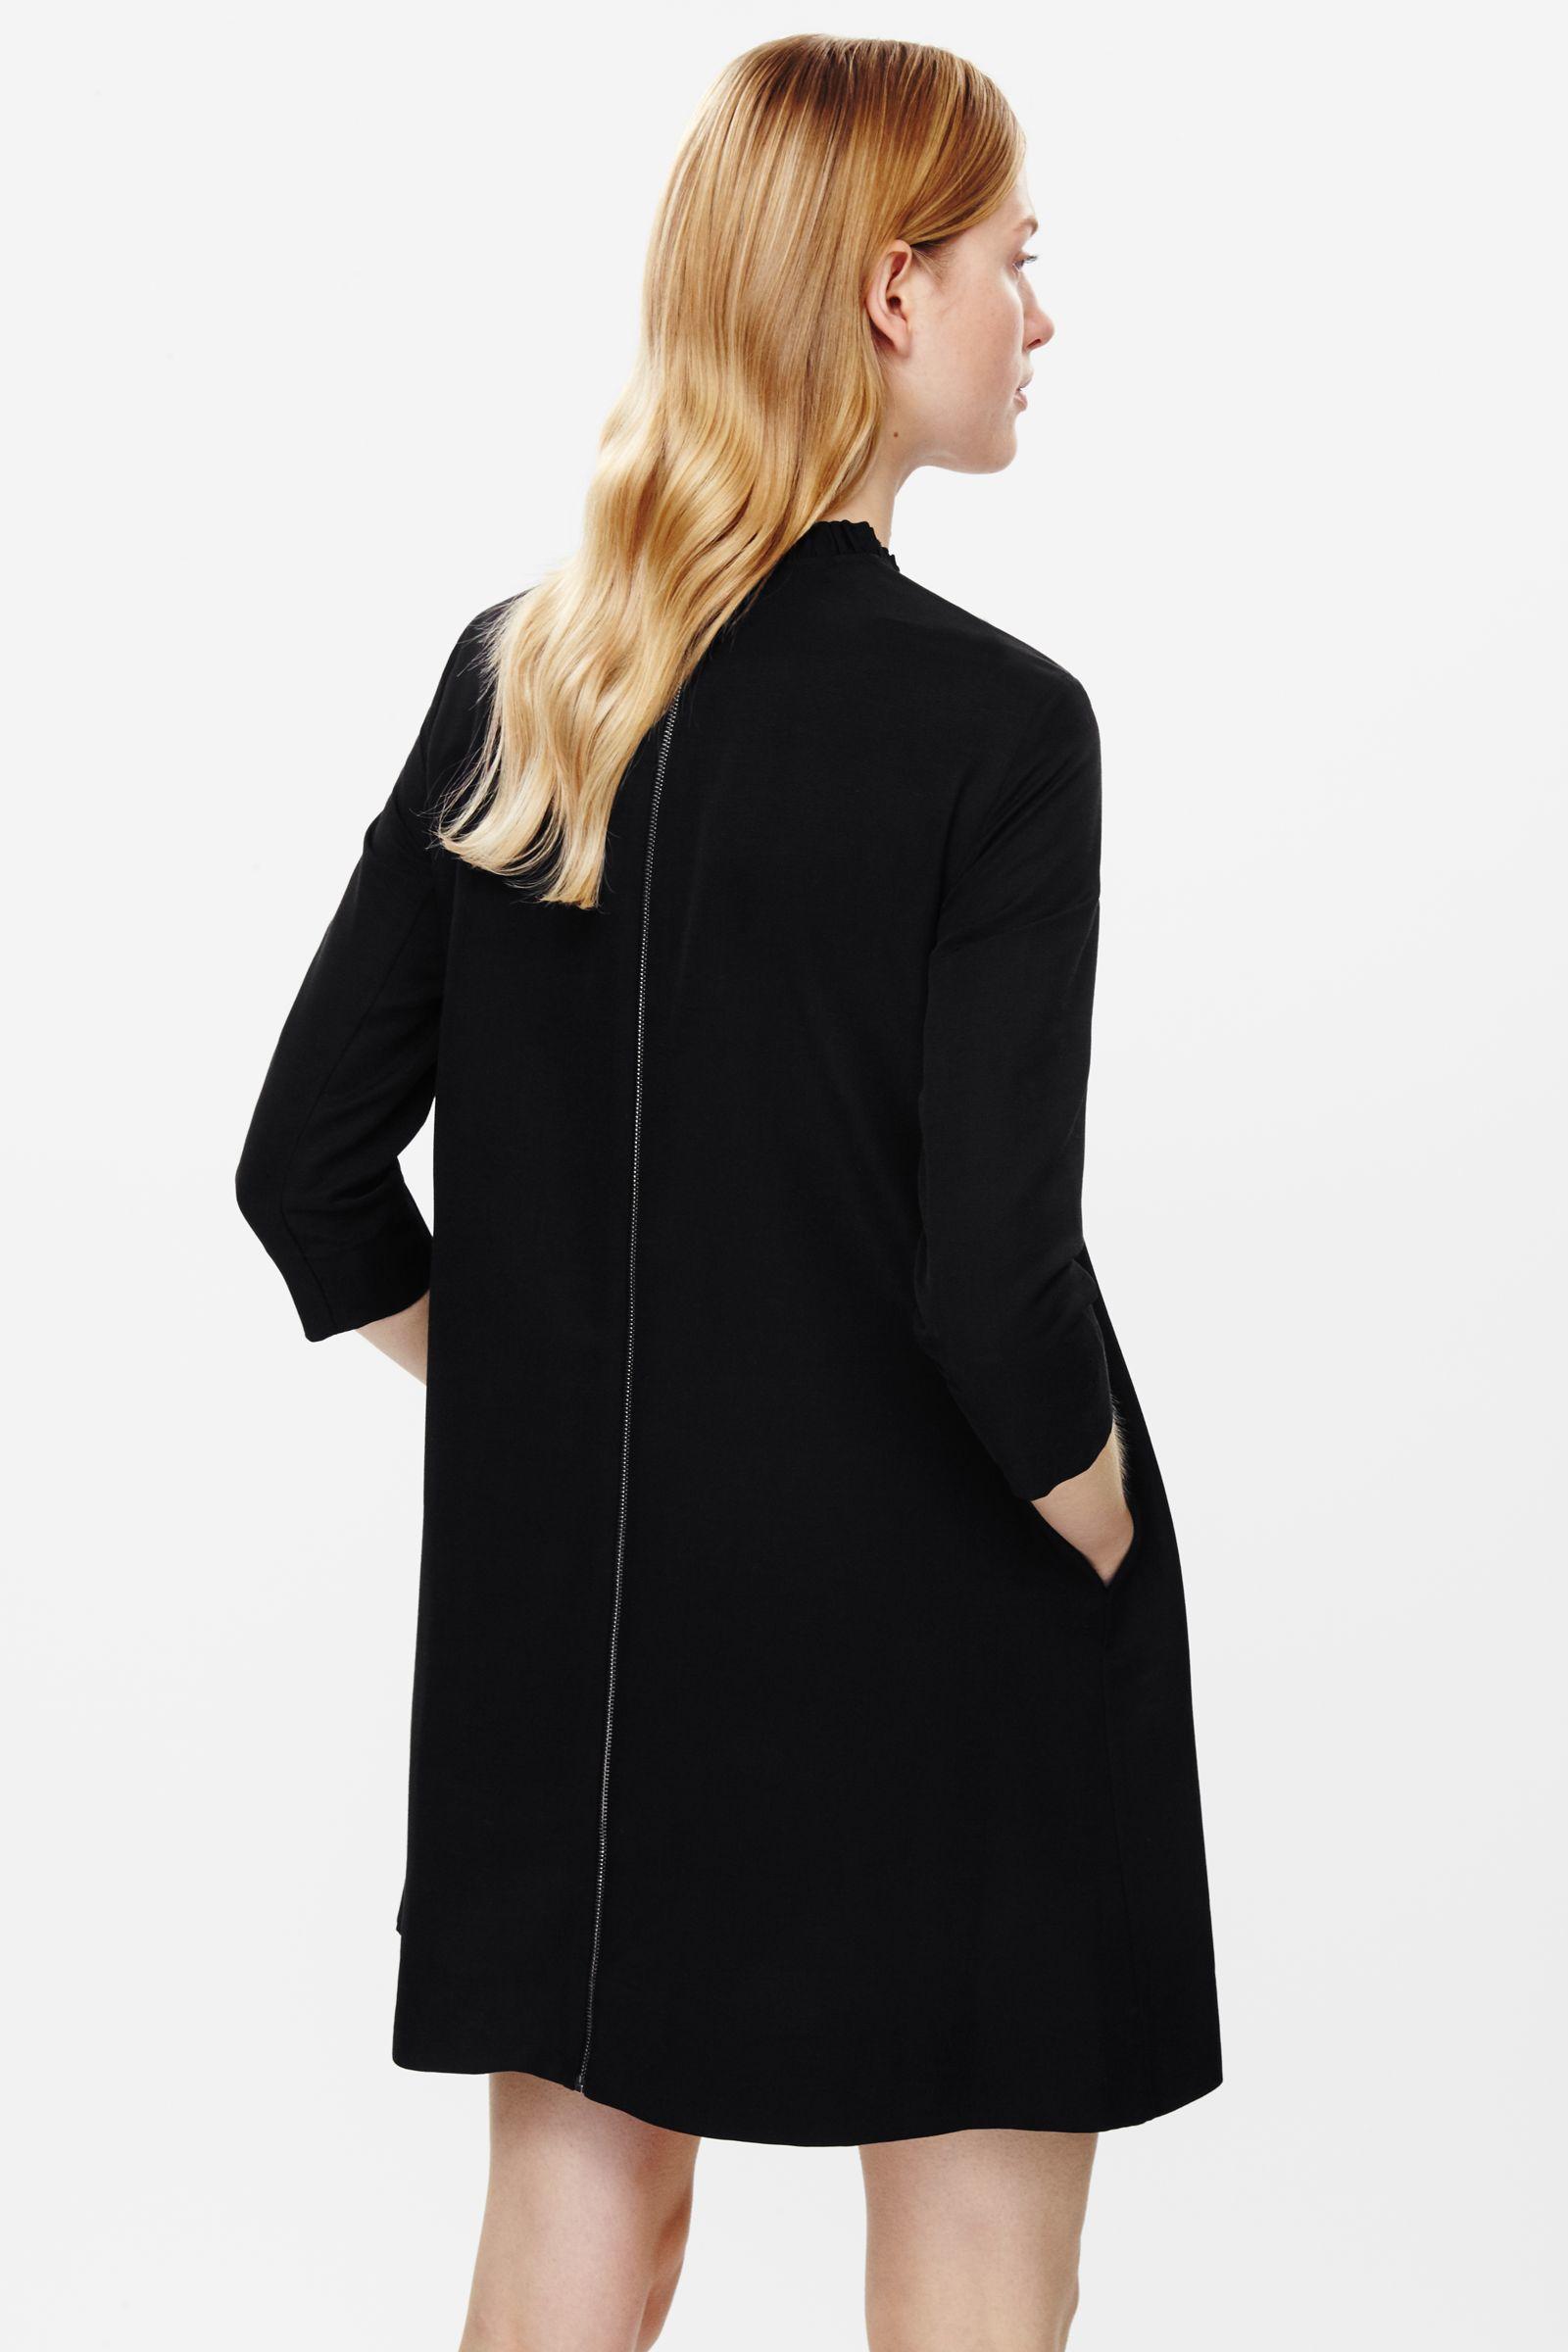 Cos Frill Collar Dress in Multicolor (Black)